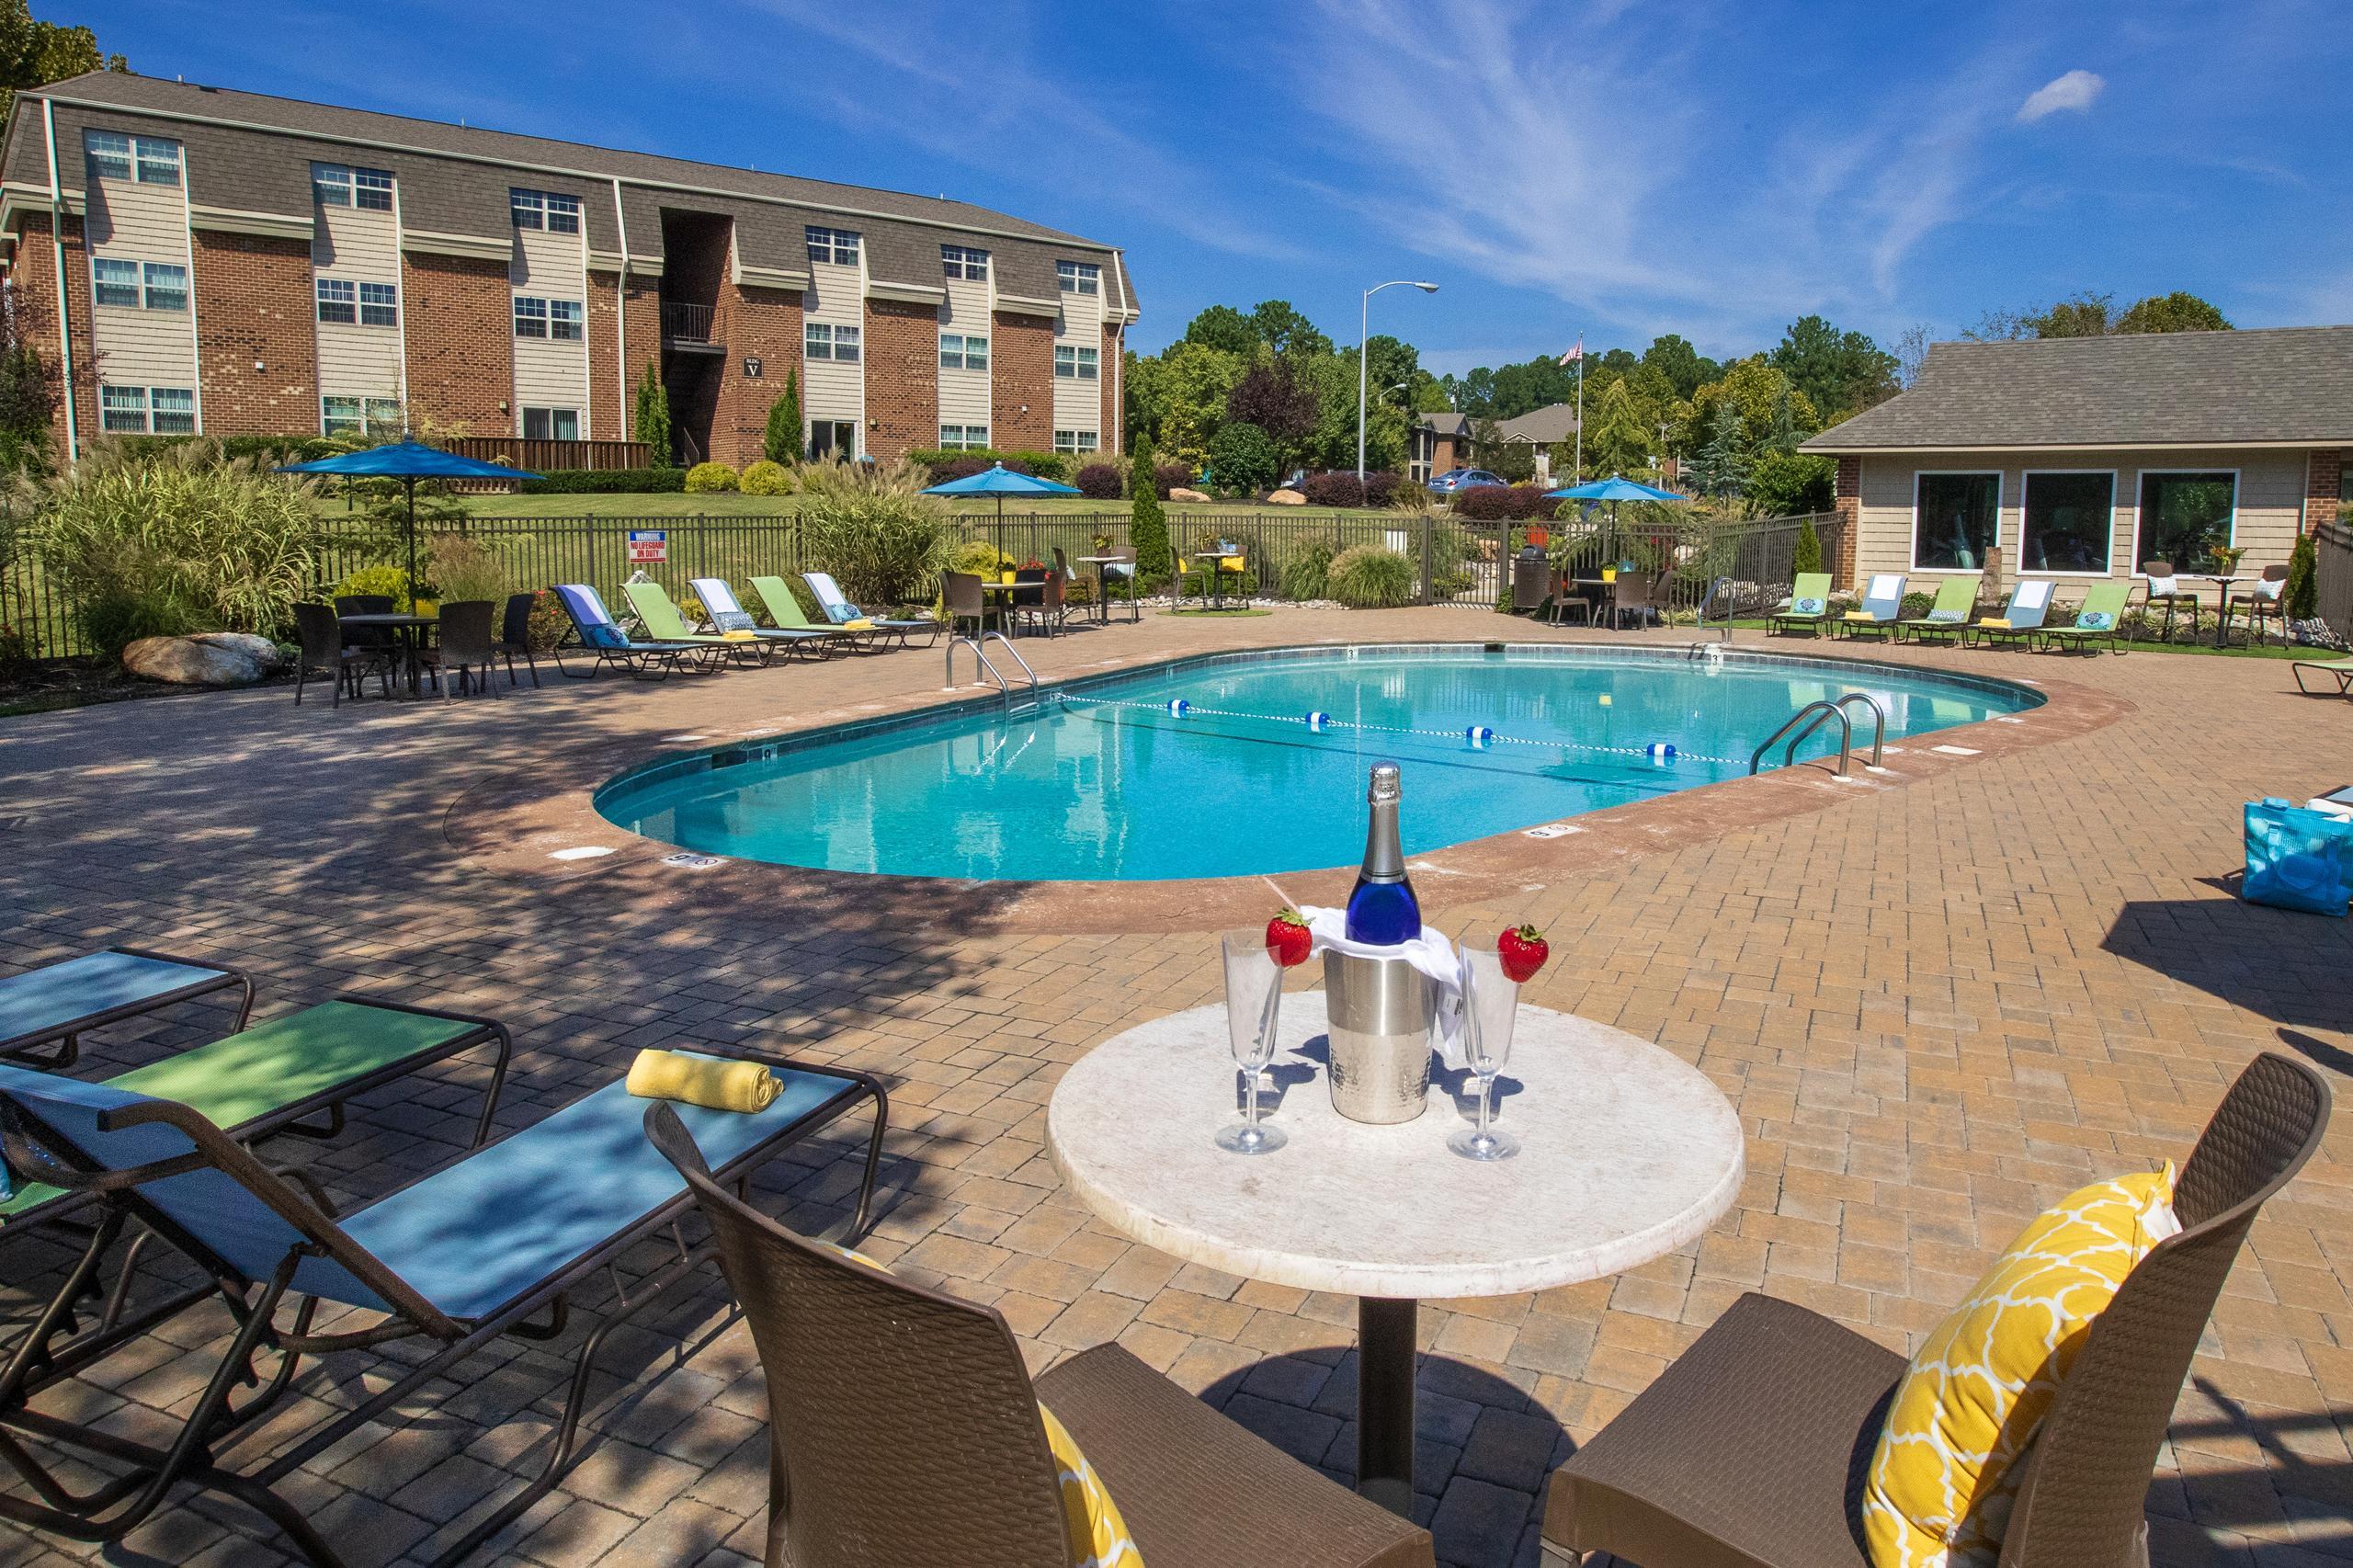 Carrboro, NC Apartments for Rent - Aspen Square Management